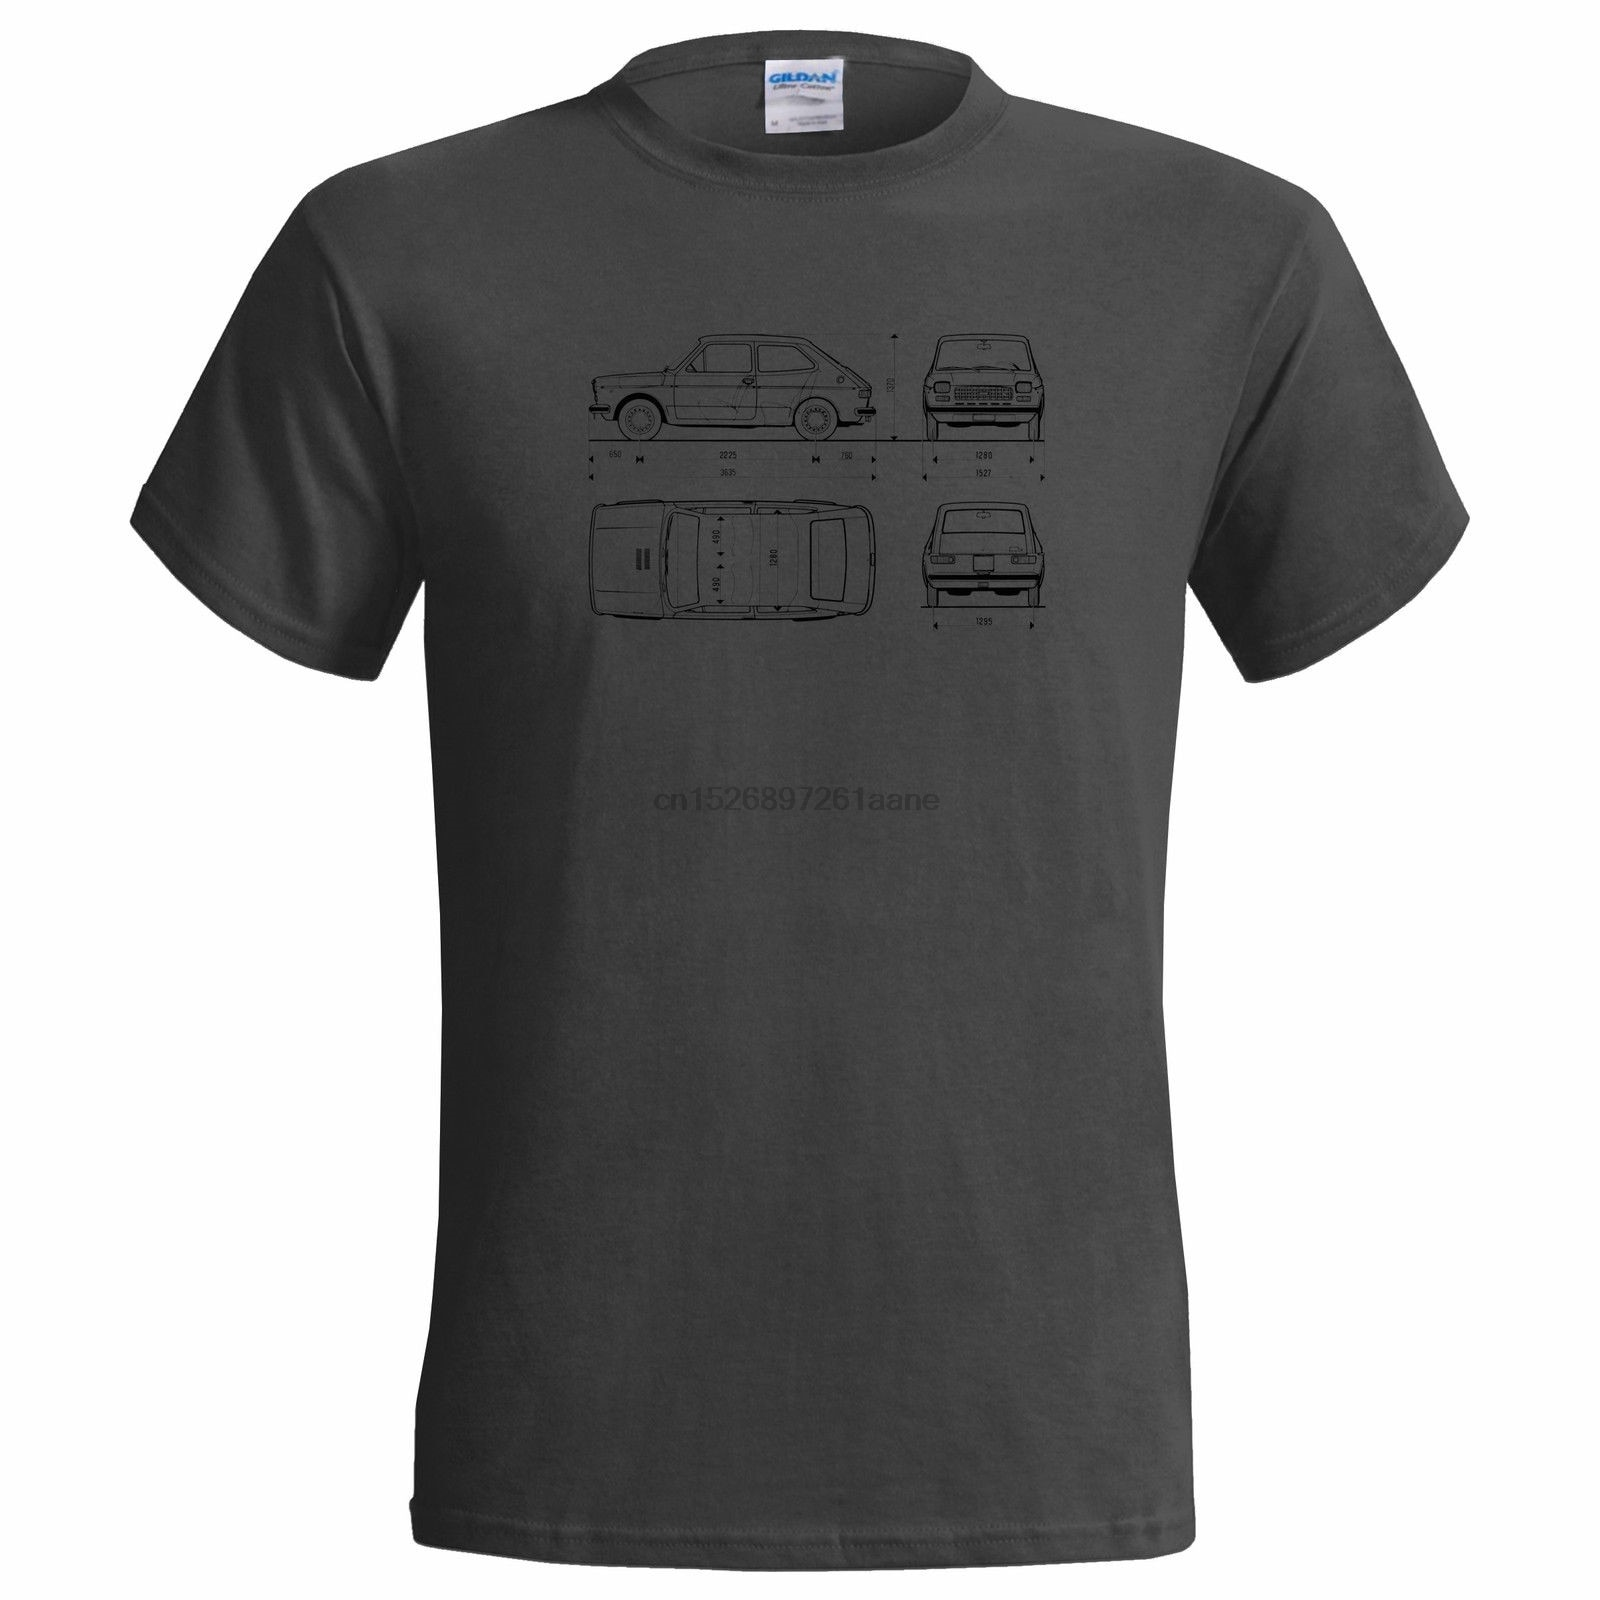 No Oficial Blueprint of FIAT 127 MENS T SHIRT clásico coche verano hombres moda TeeComfortable t shirts casual Camiseta de manga corta